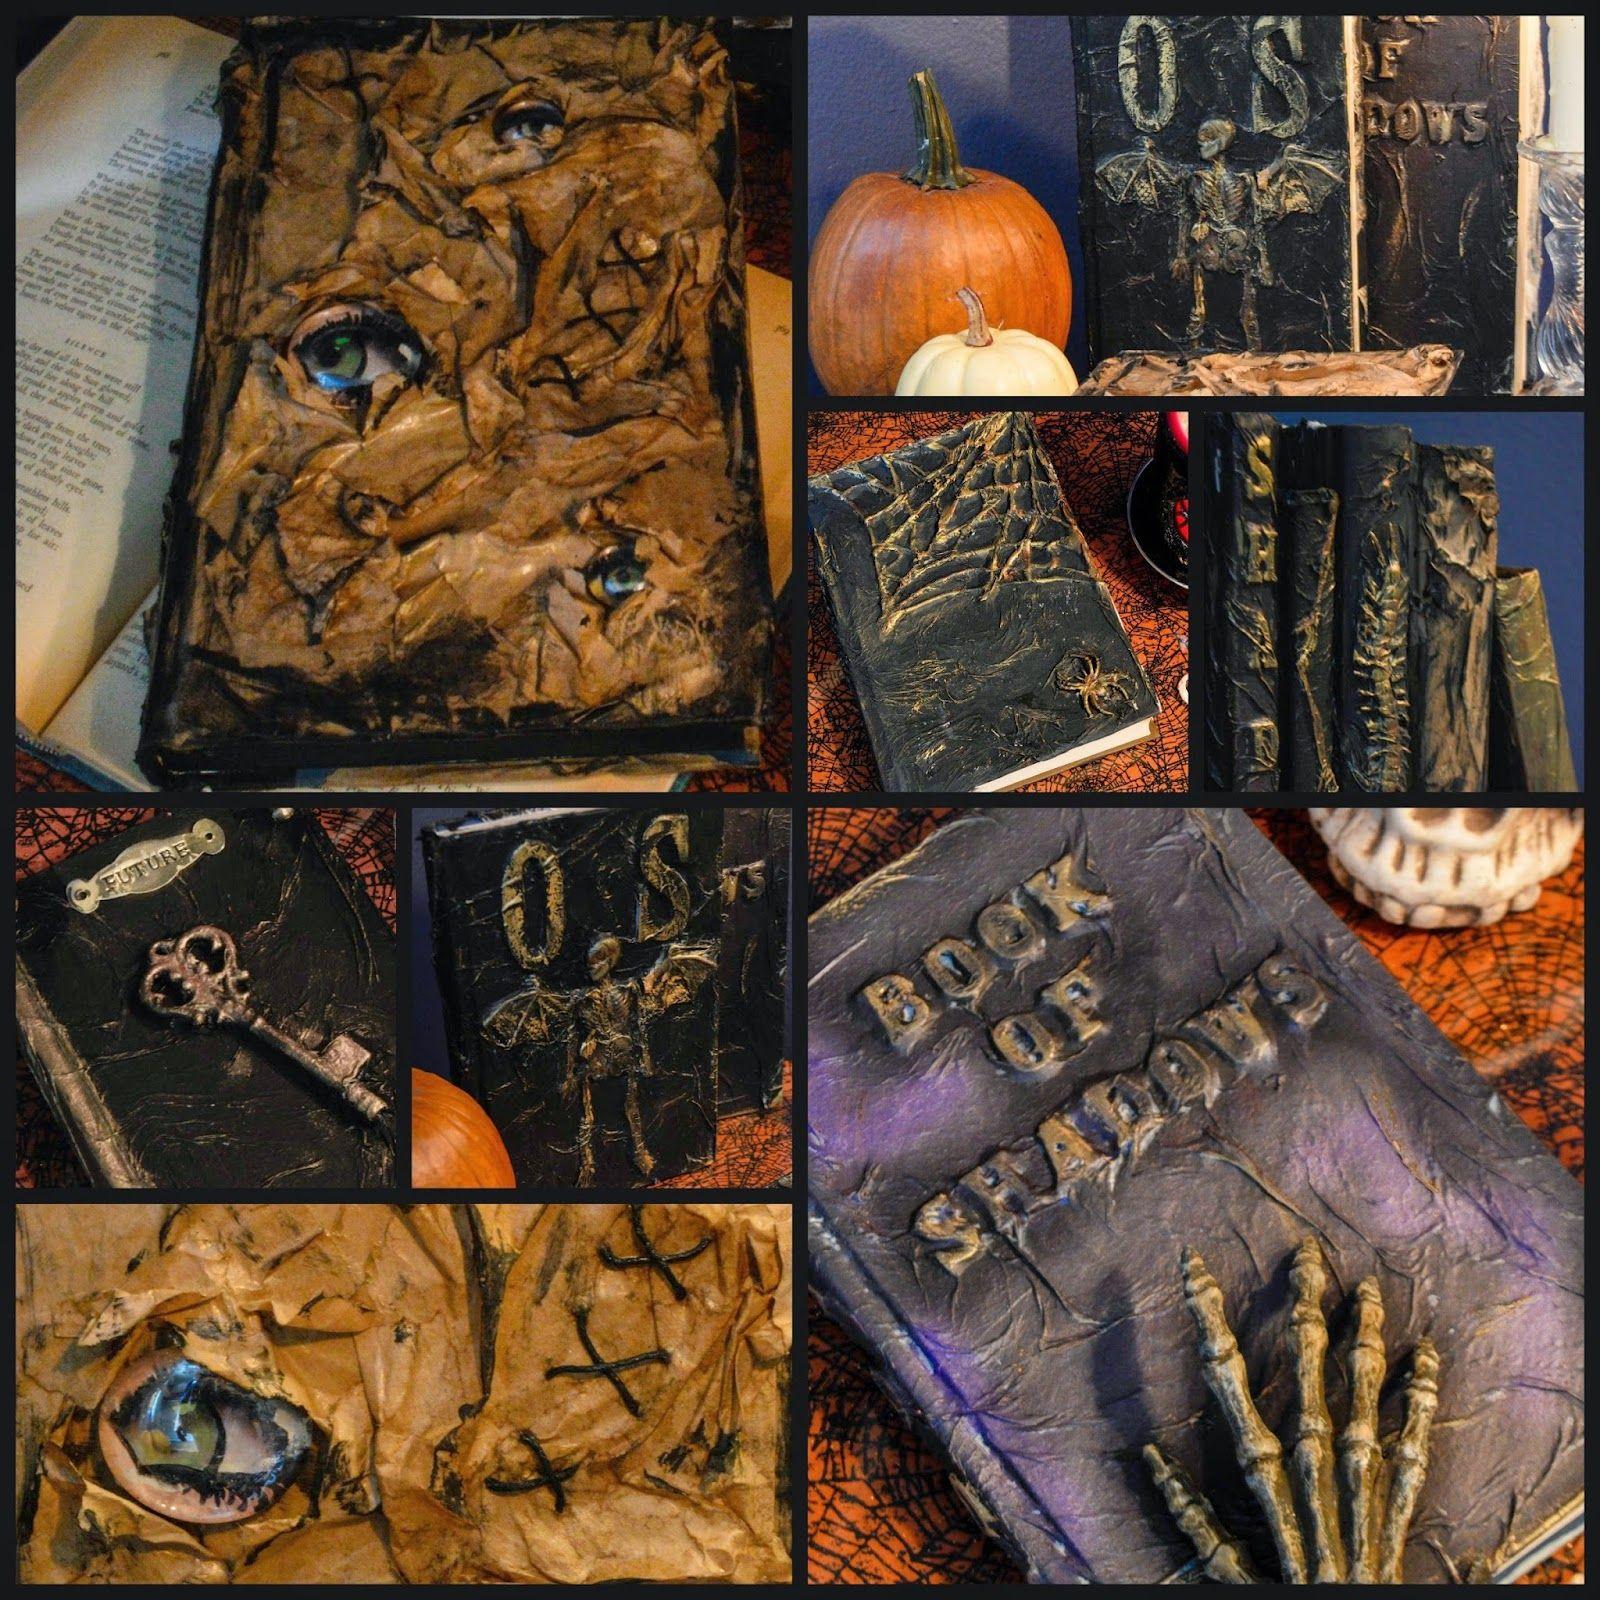 spell books creepy halloween - photo #14